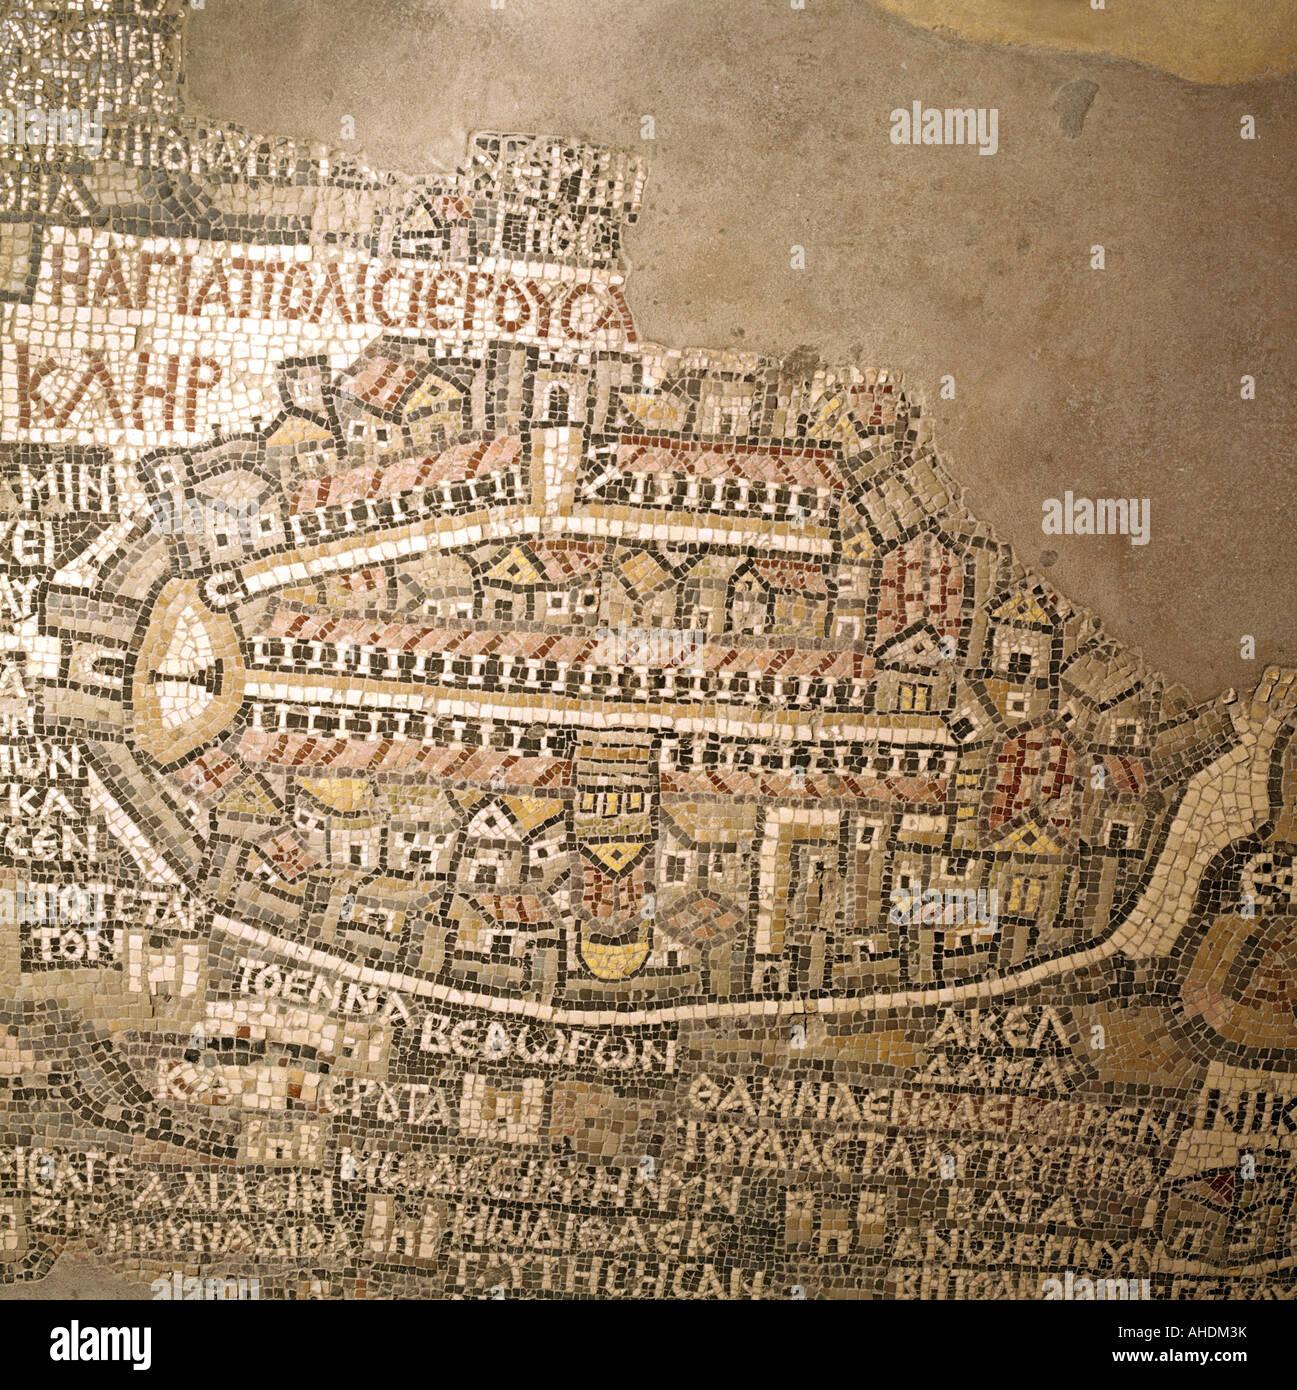 cartography maps oldest map of Palestine detail Jerusalem 6th